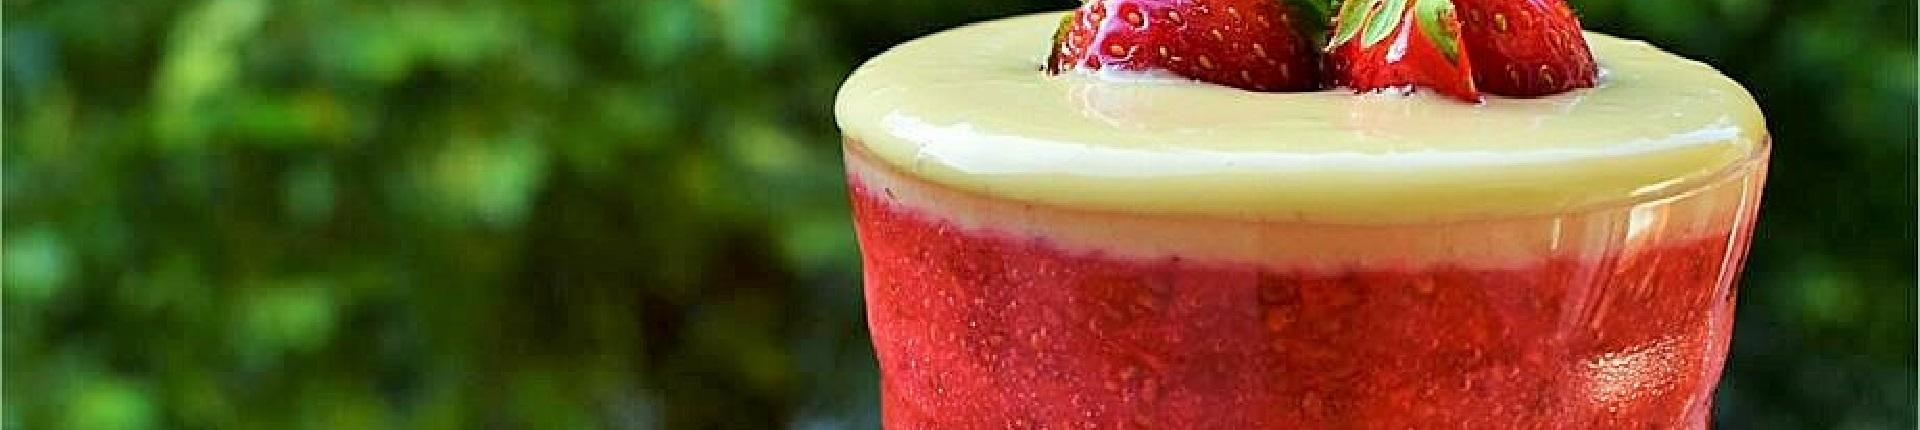 Truskawkowy chia pudding